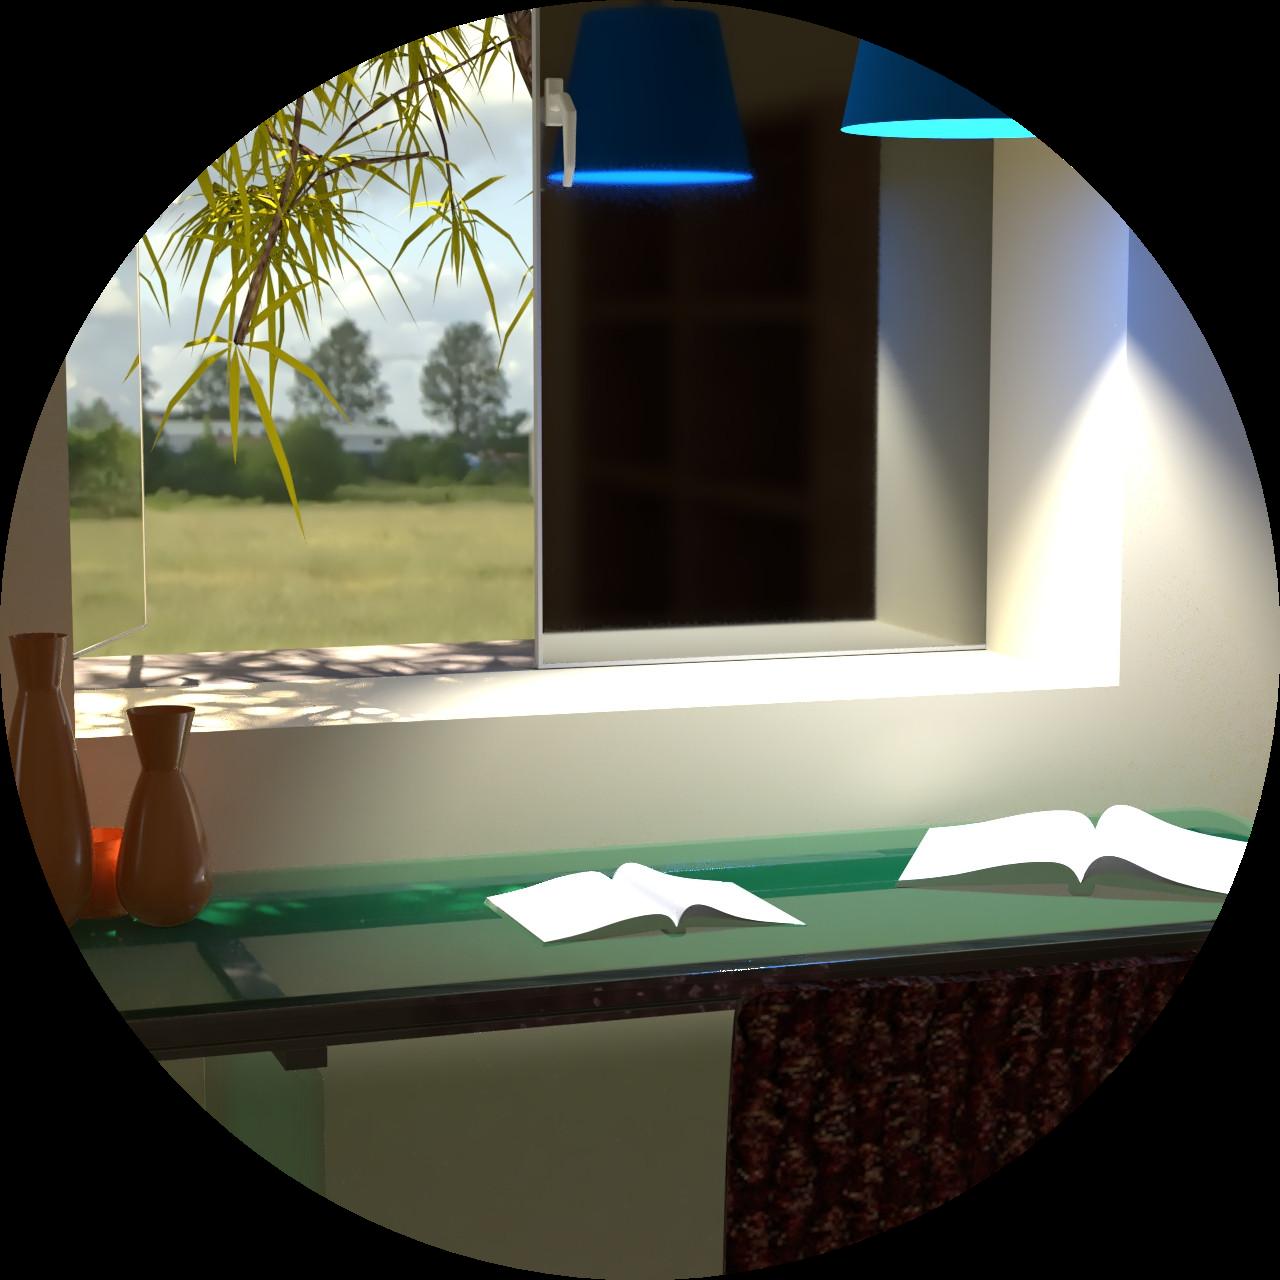 Photo-realistic rendering